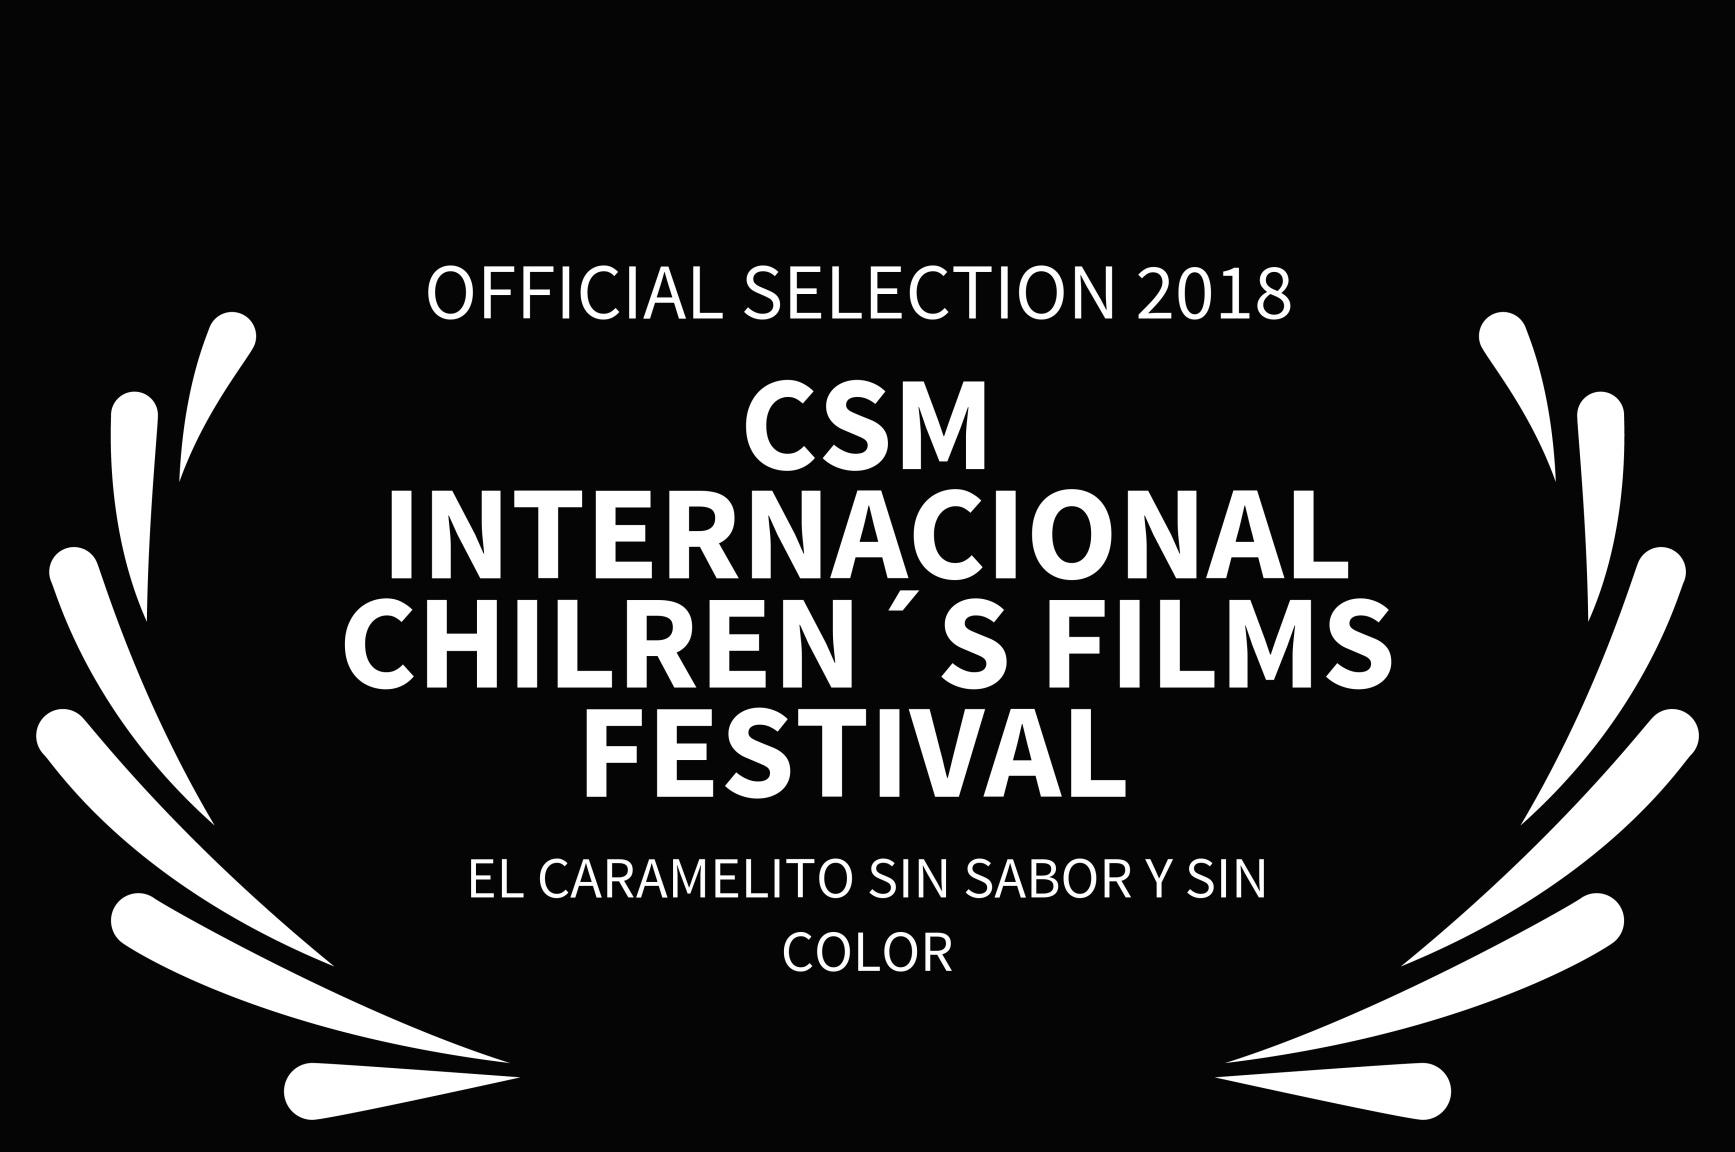 CSM INTERNACIONAL CHILRENS FILMS FESTIVA